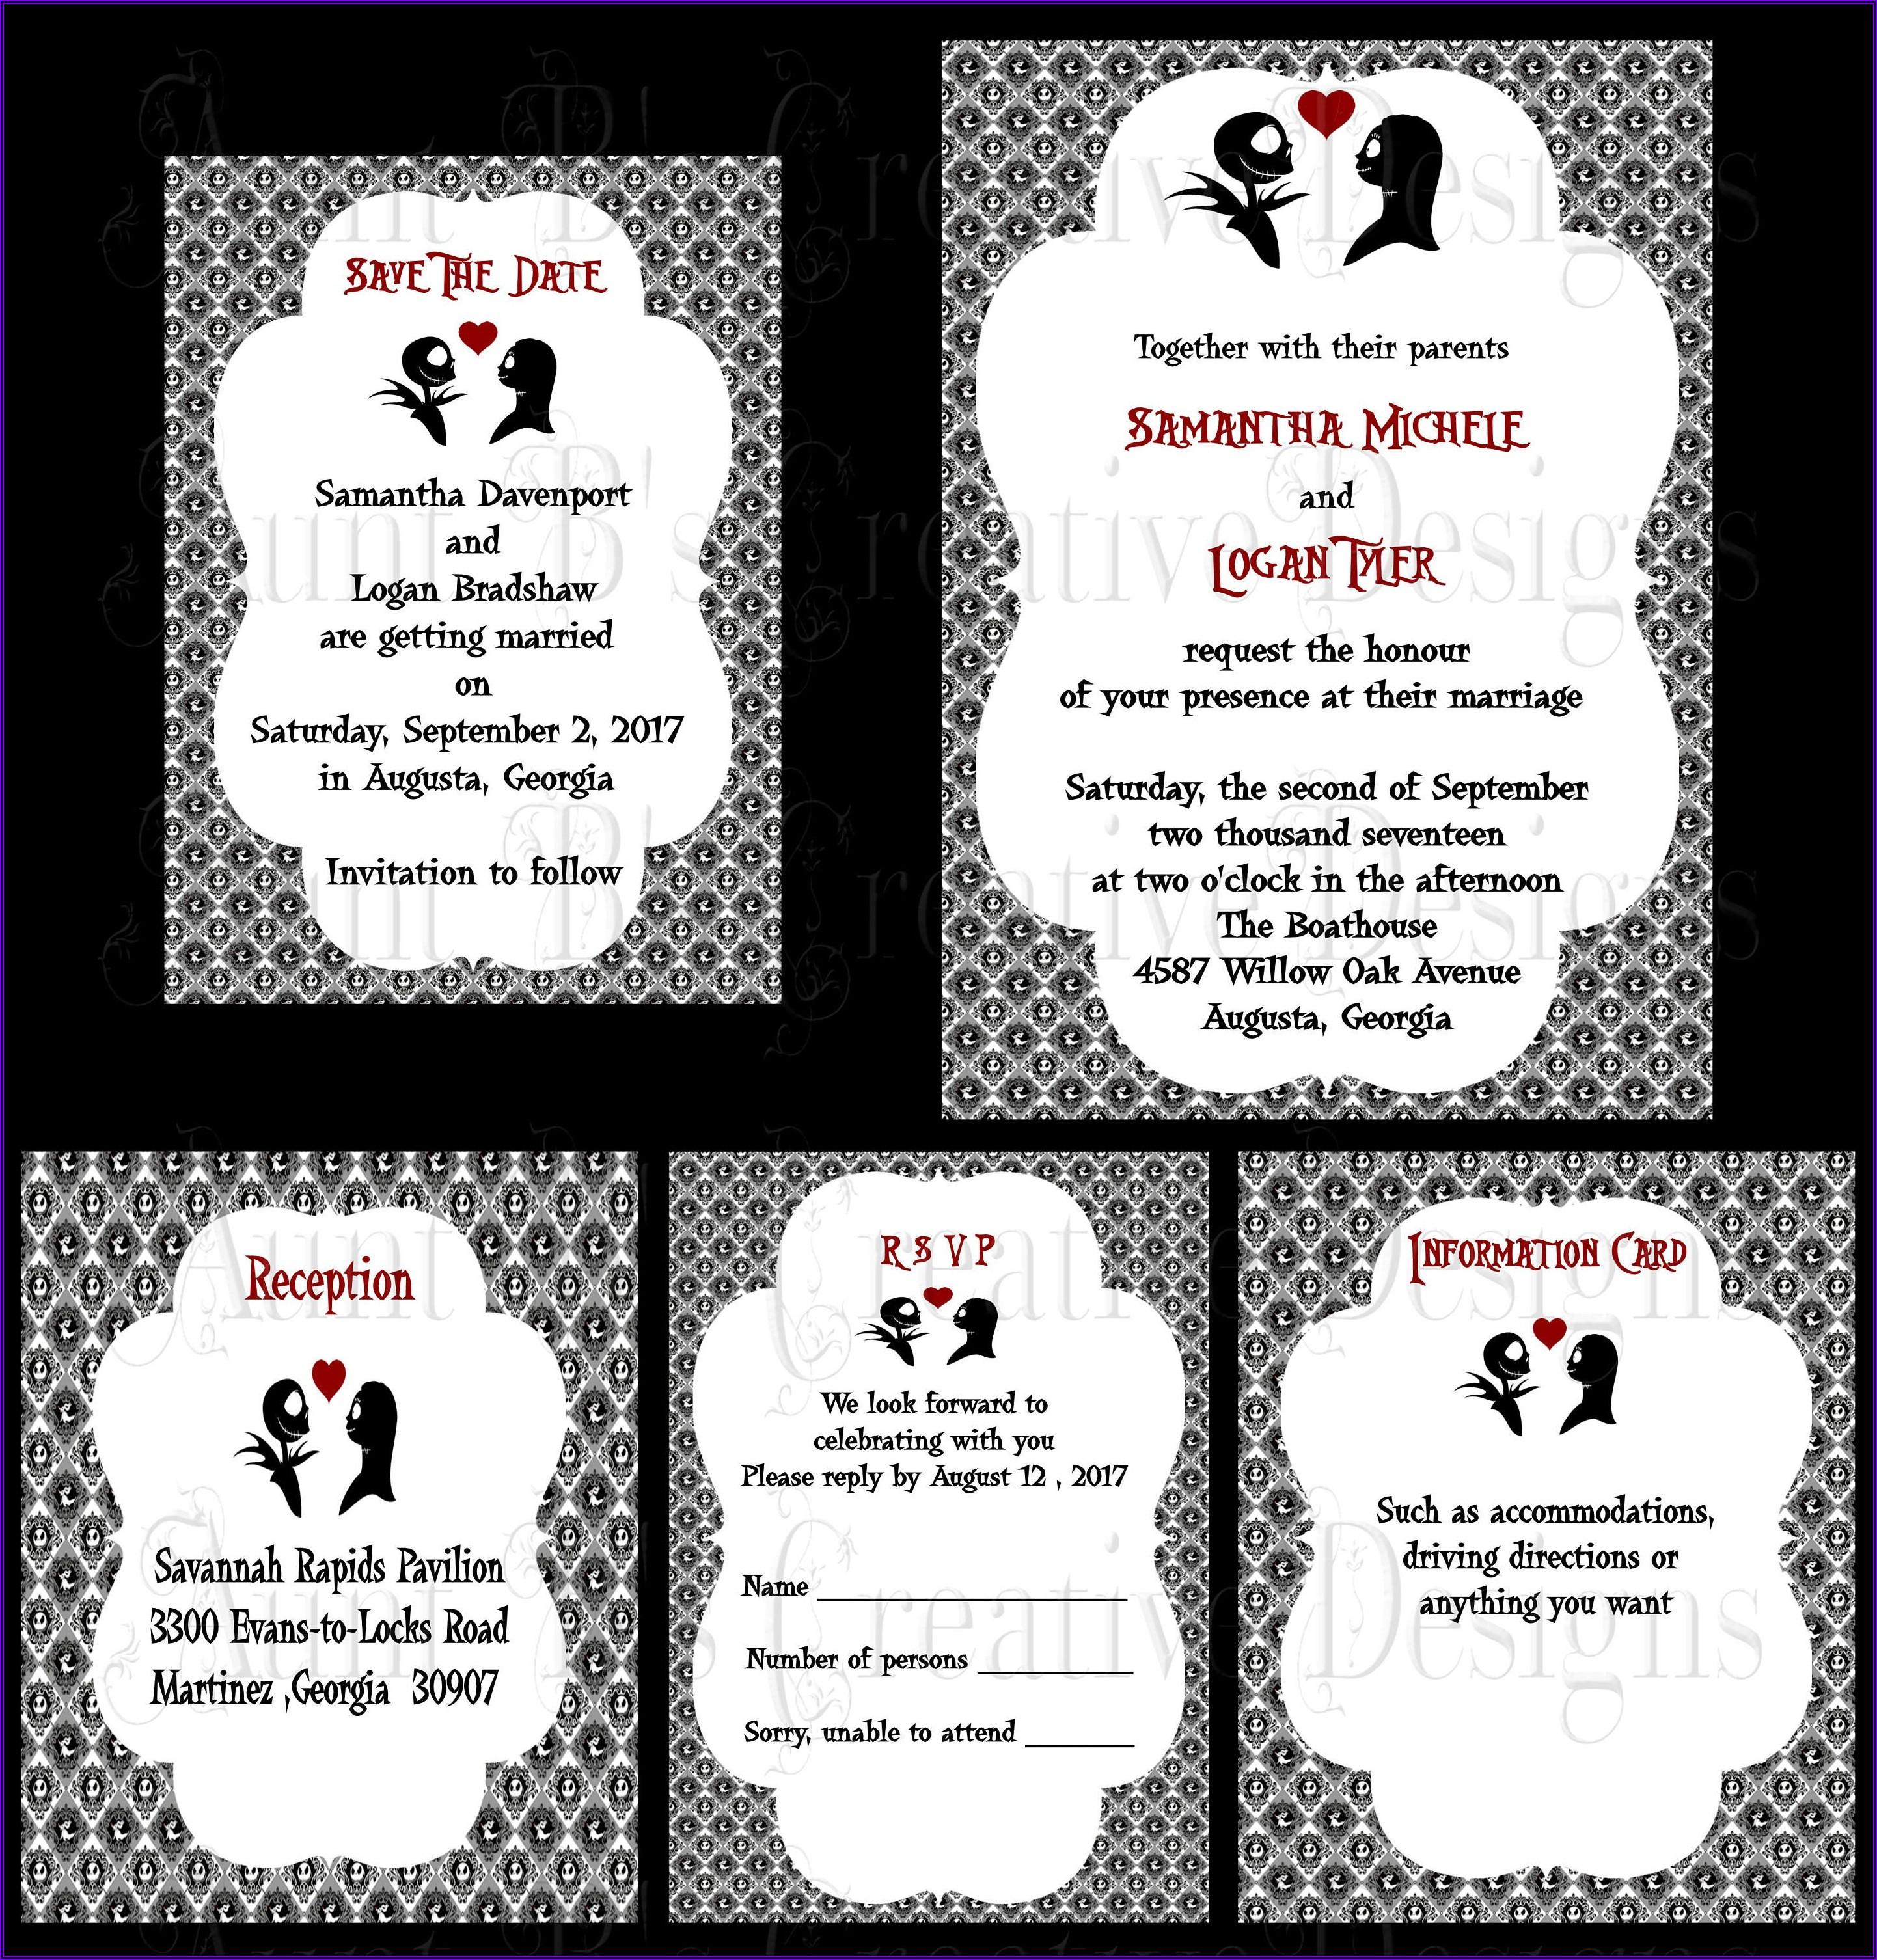 How To Make Nightmare Before Christmas Wedding Invitations